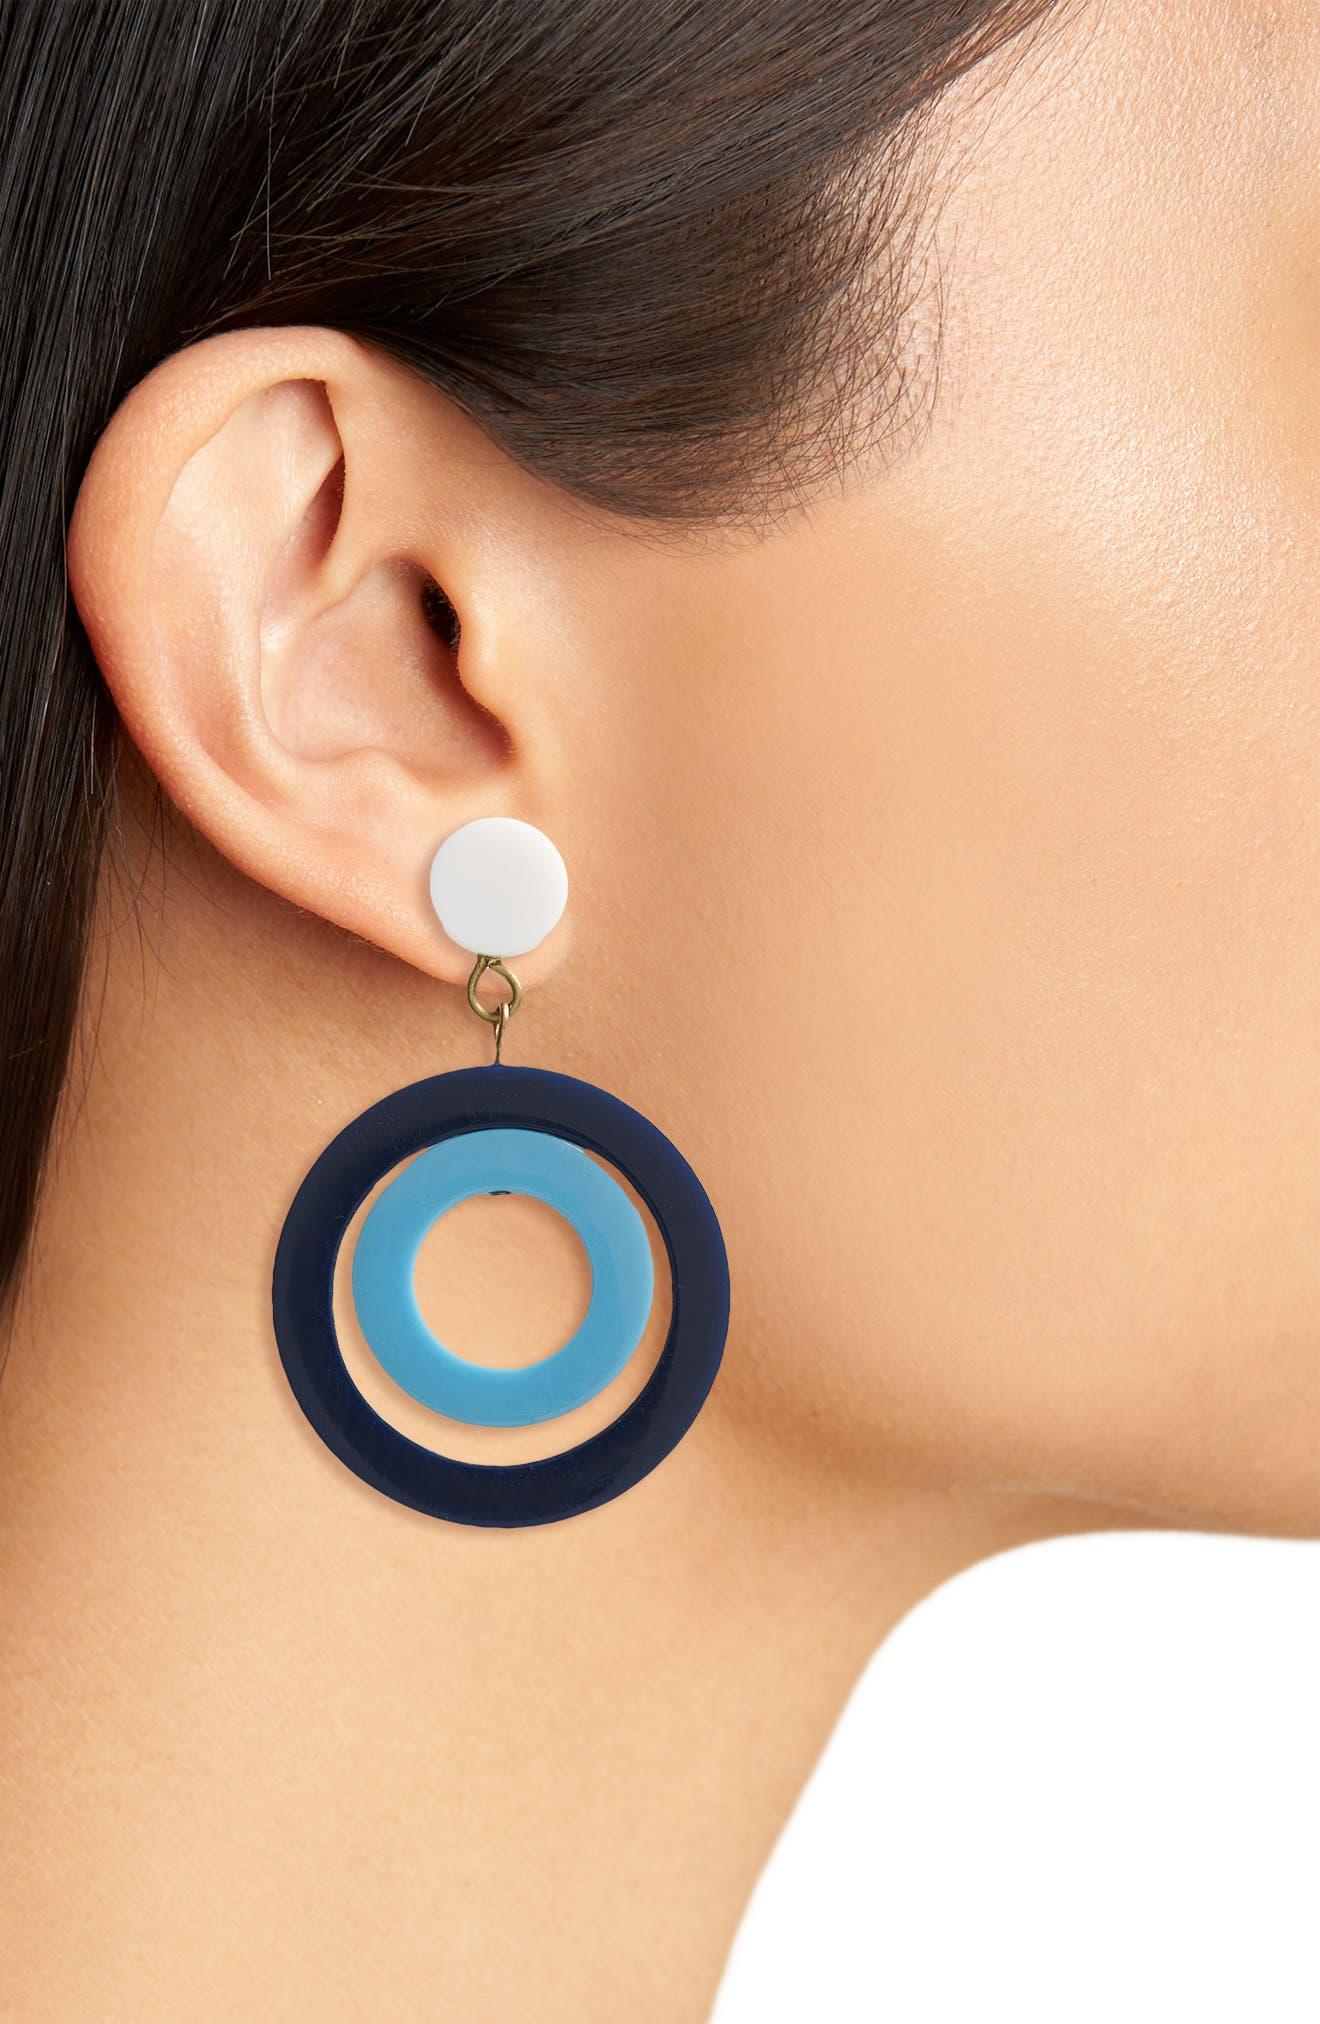 Huntington Earrings,                             Alternate thumbnail 2, color,                             Navy/ Turquoise